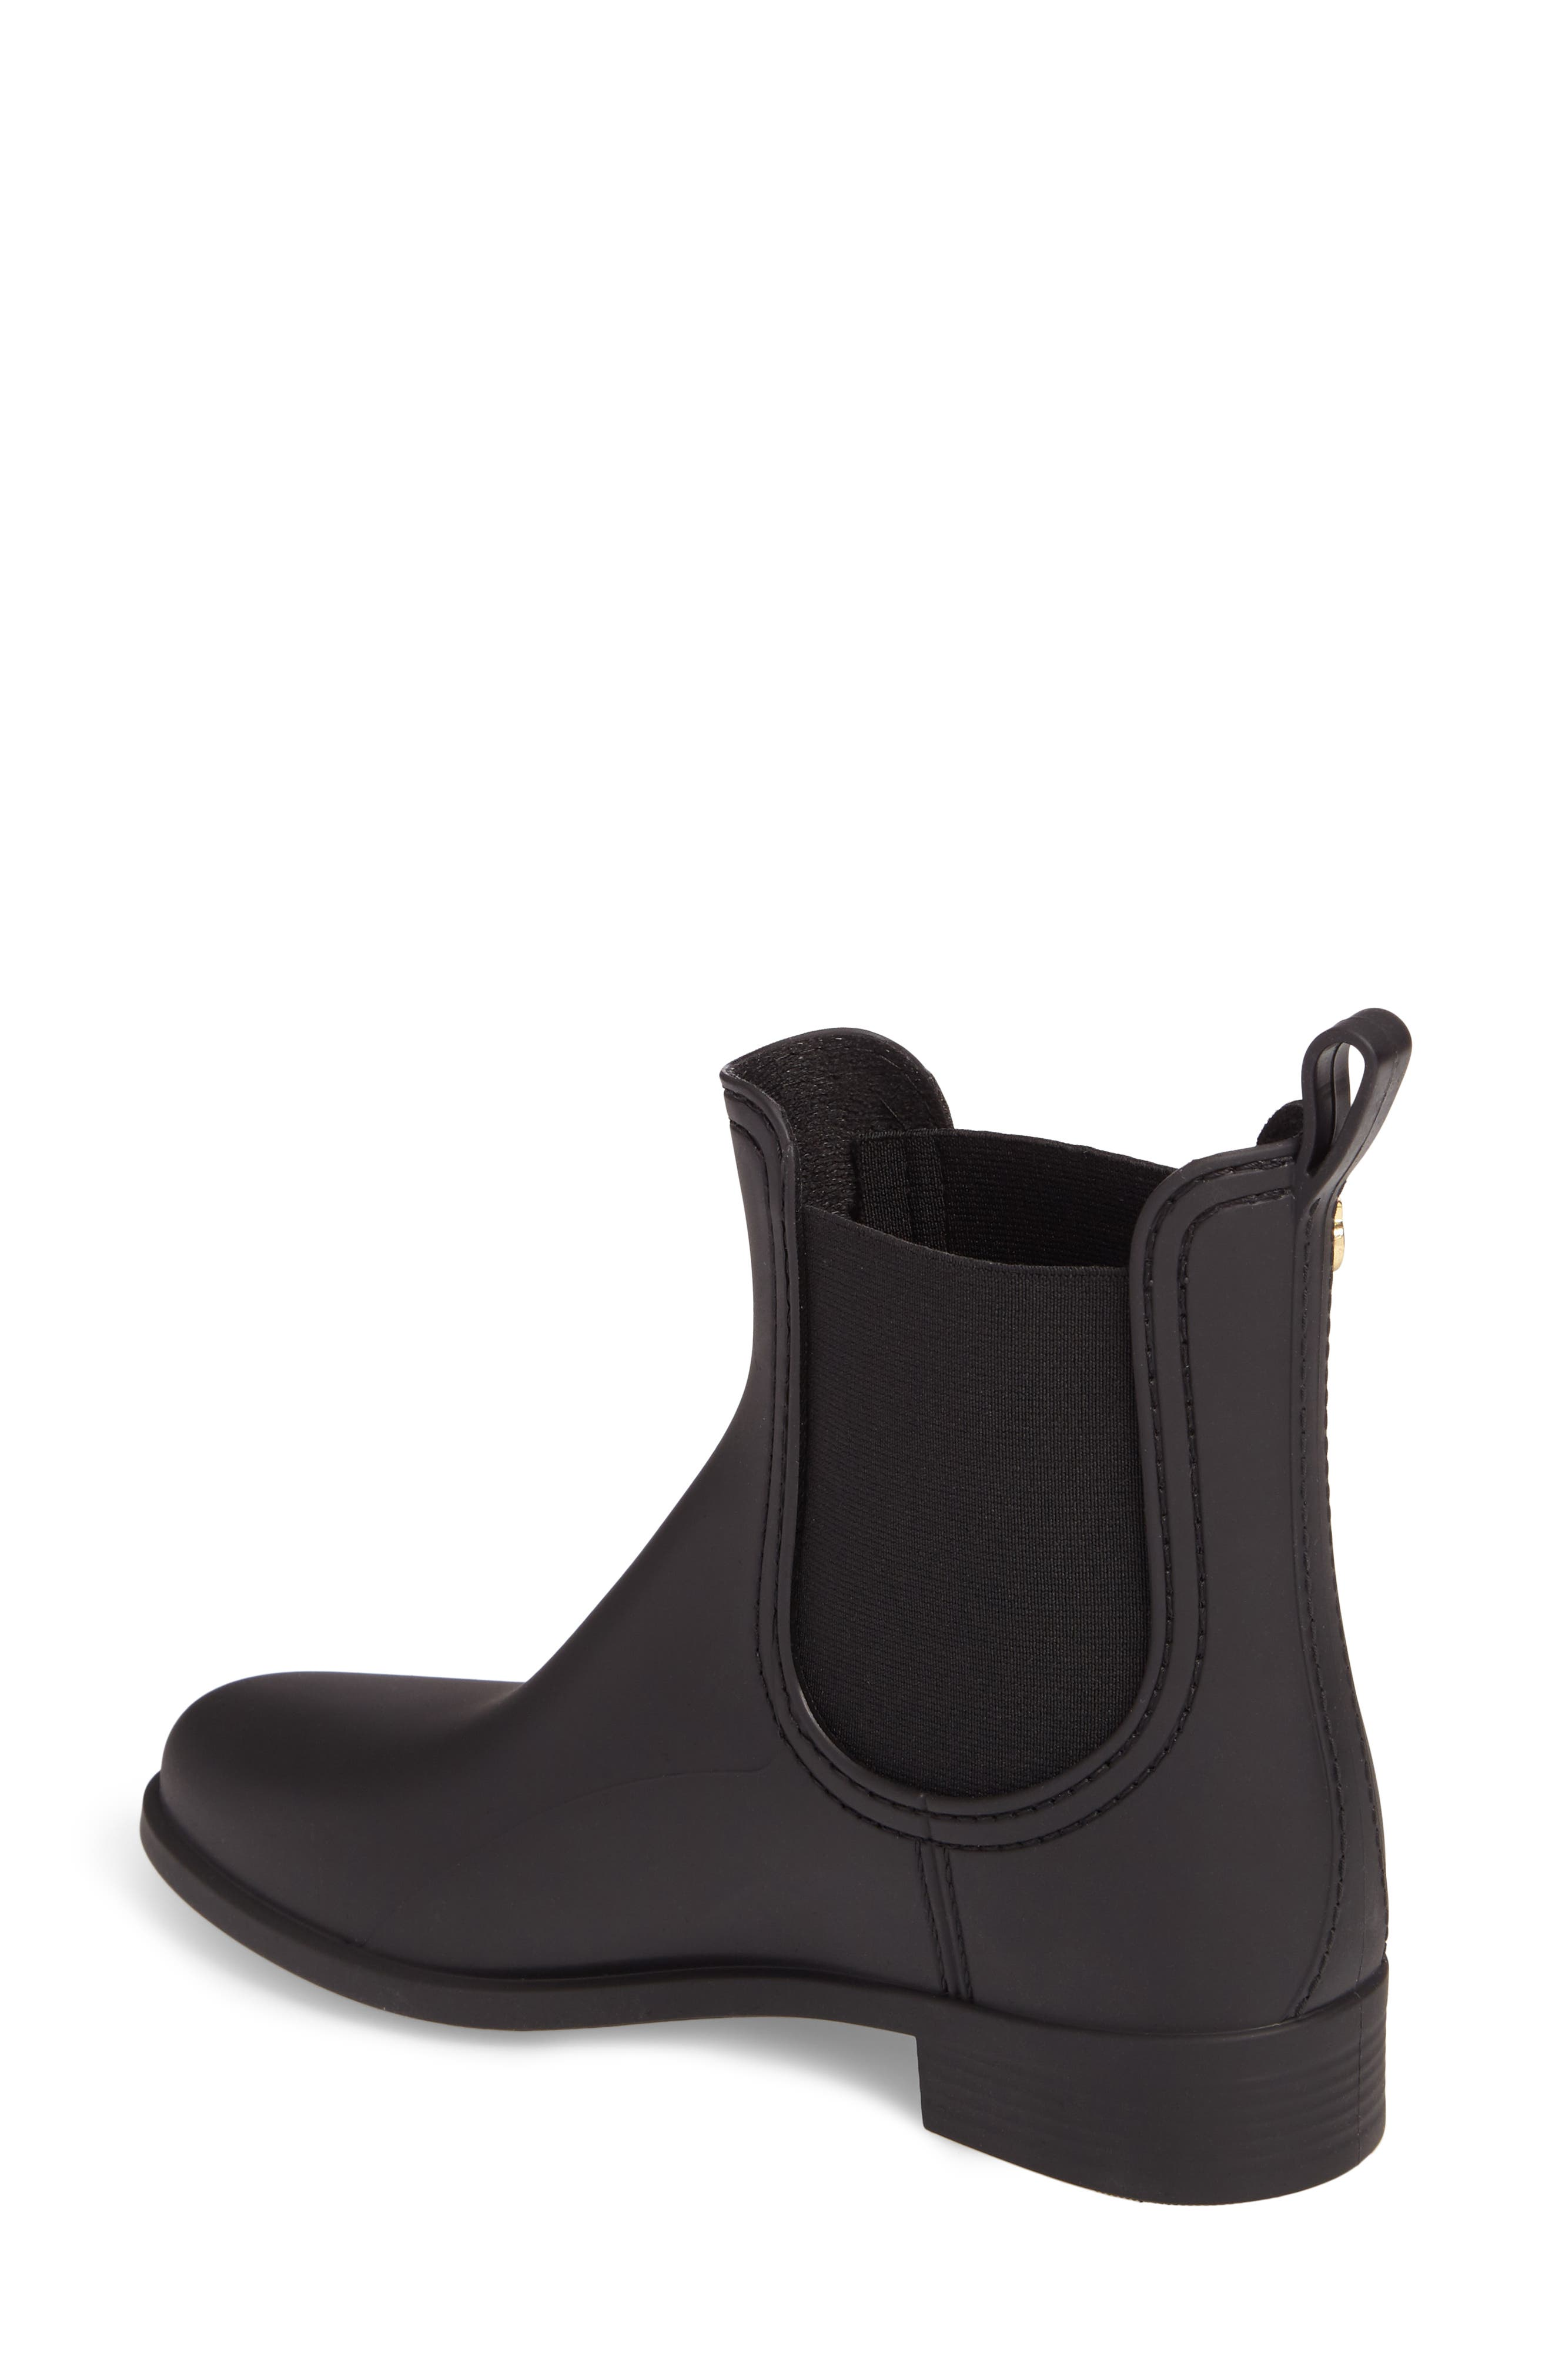 Splash Waterproof Chelsea Boot,                             Alternate thumbnail 2, color,                             002